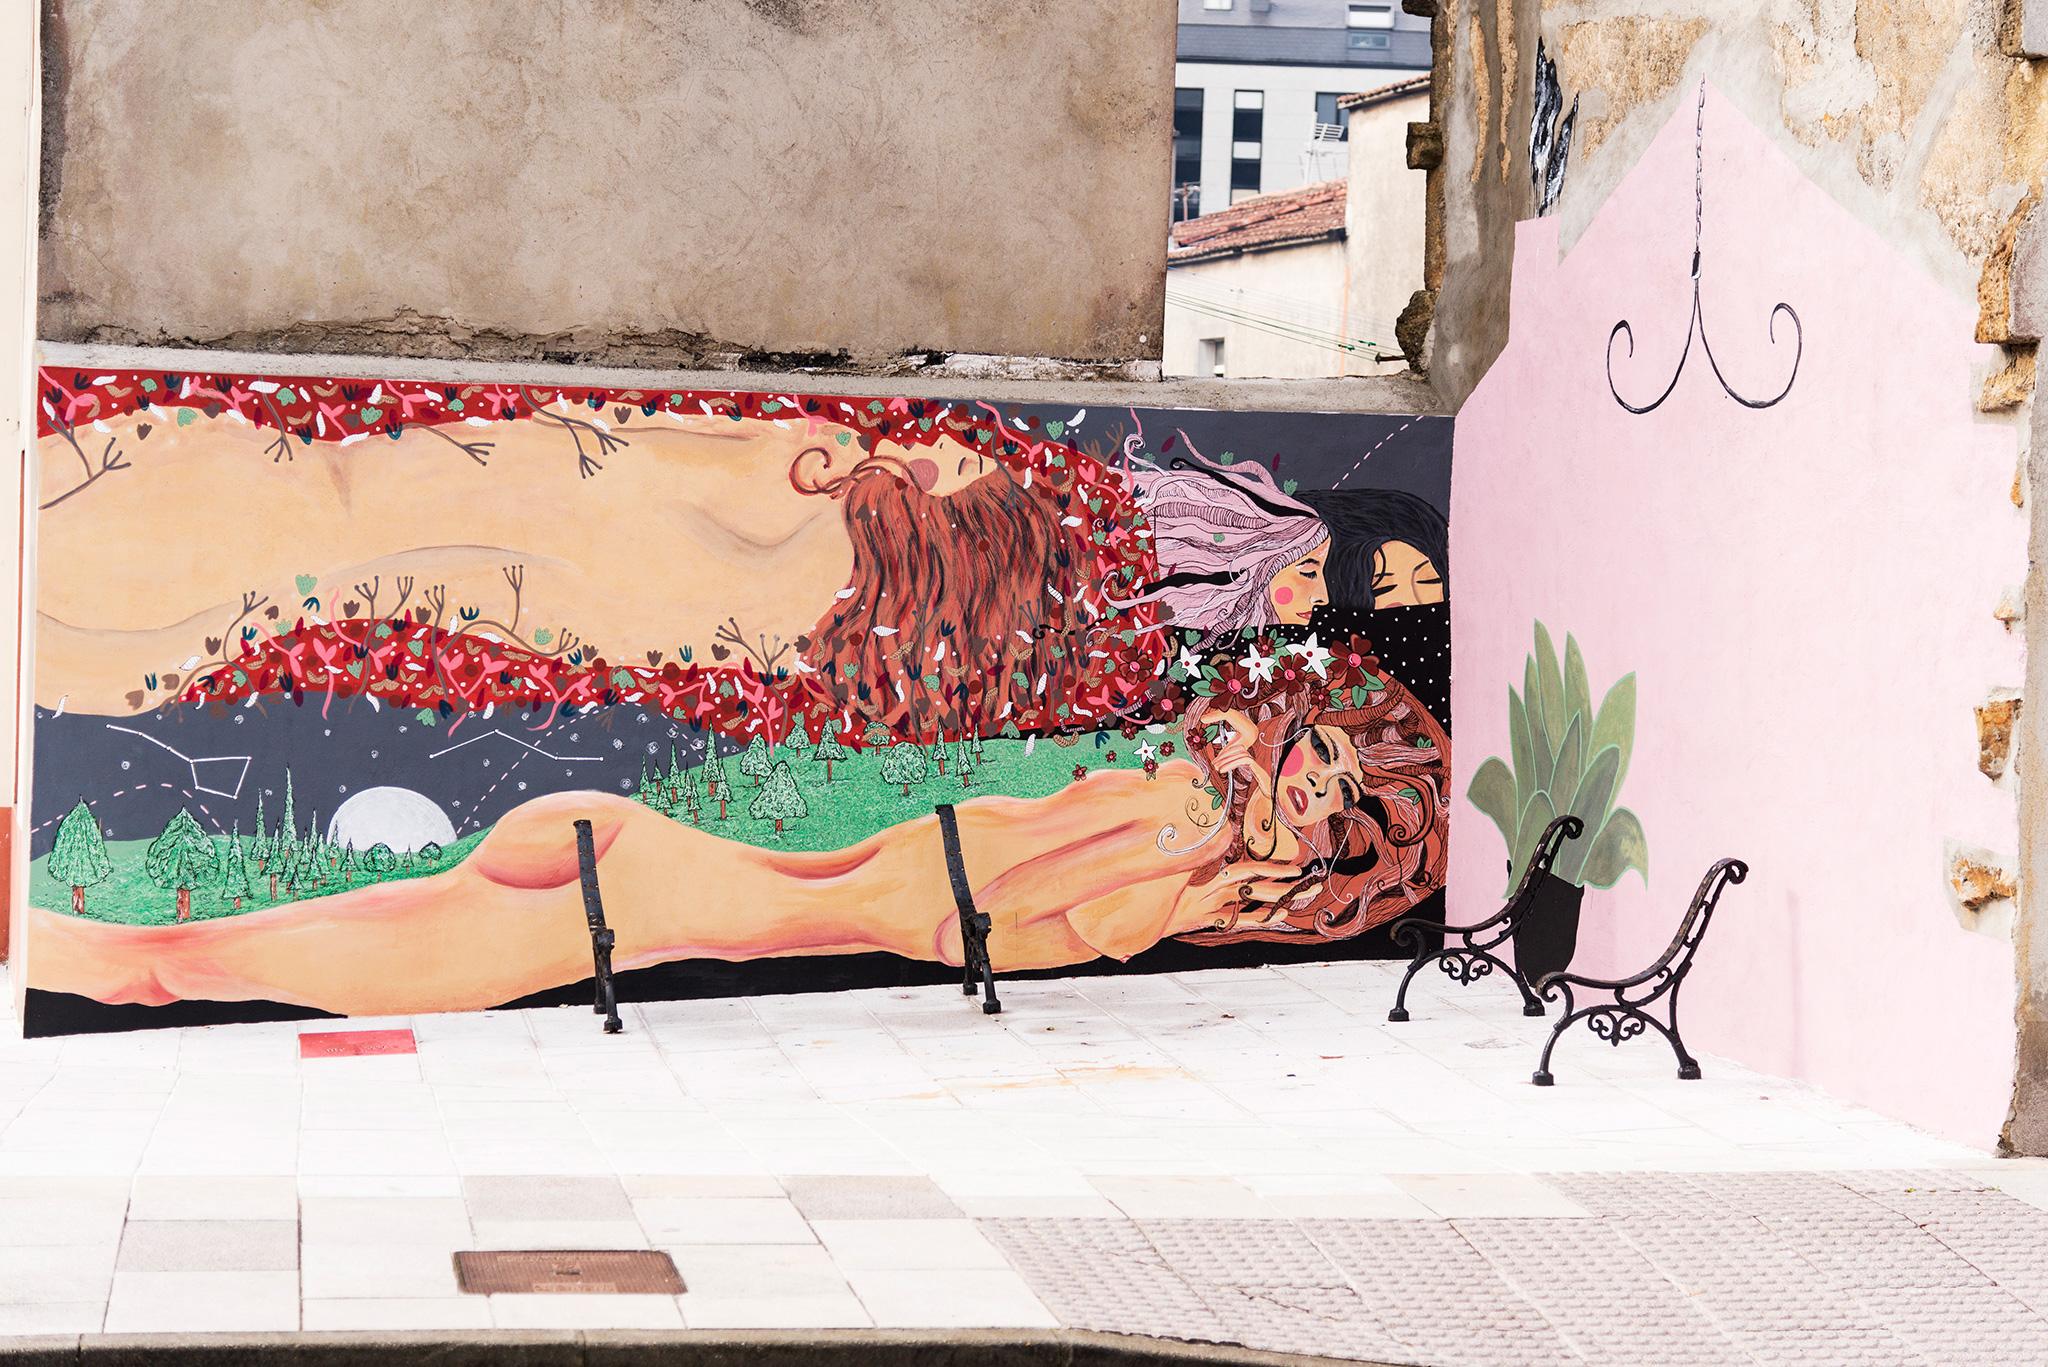 Foto principal mural Representación de Serpes de auga